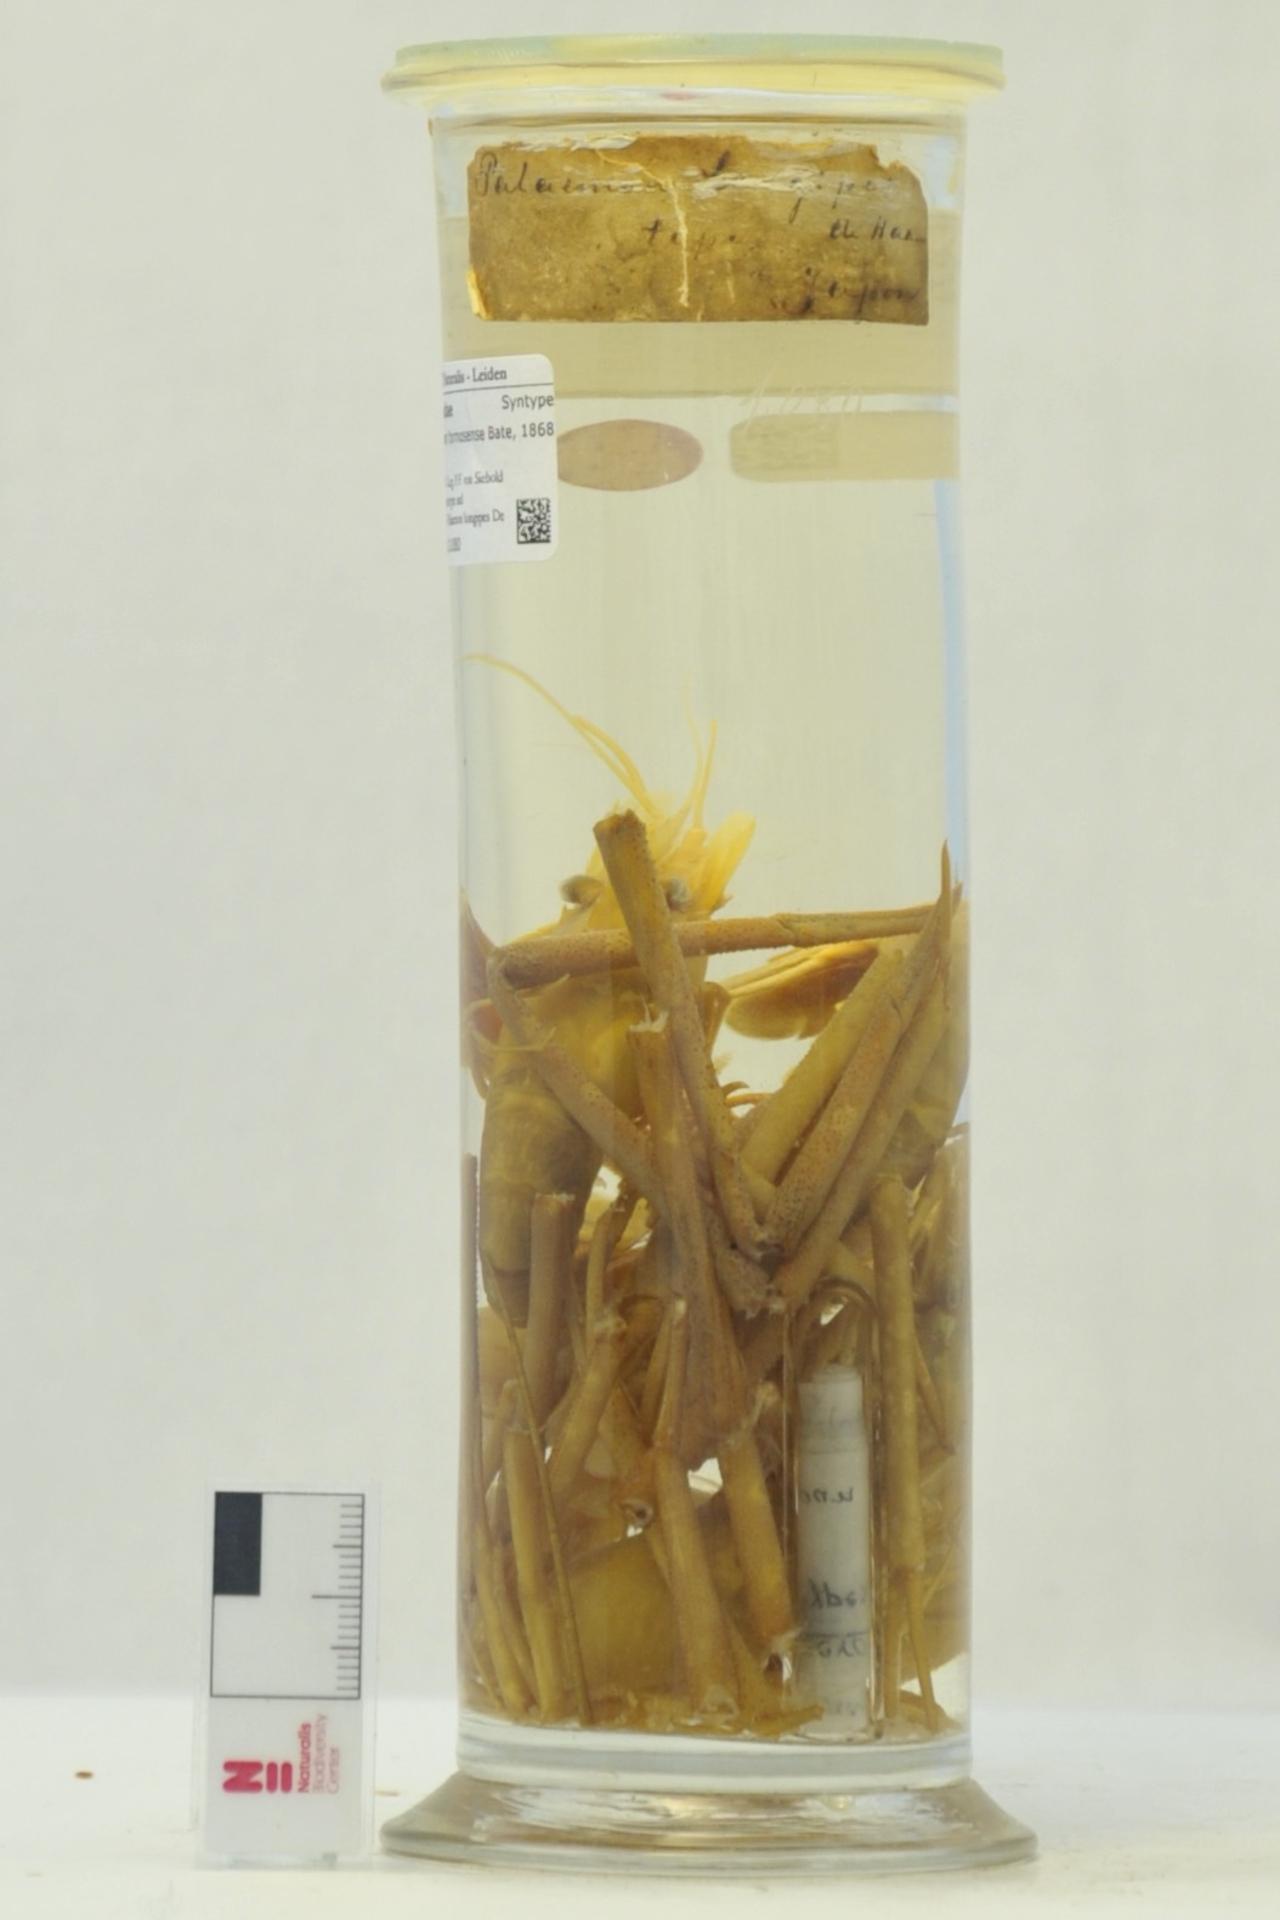 RMNH.CRUS.D.1080 | Macrobrachium formosense Bate, 1868